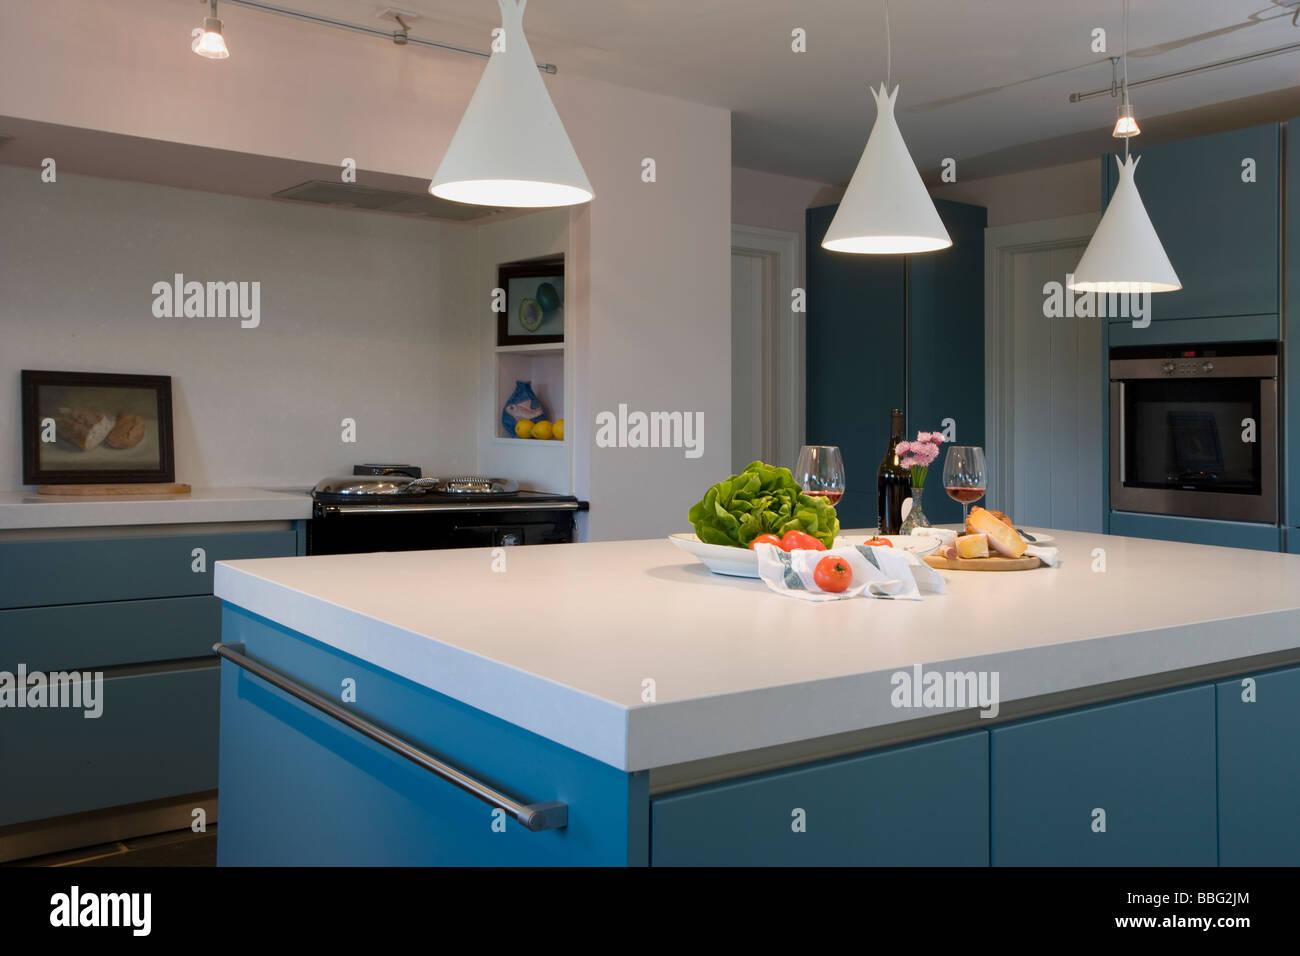 Kitchen, modern, new, clean, utilitarian,fresh,house - Stock Image